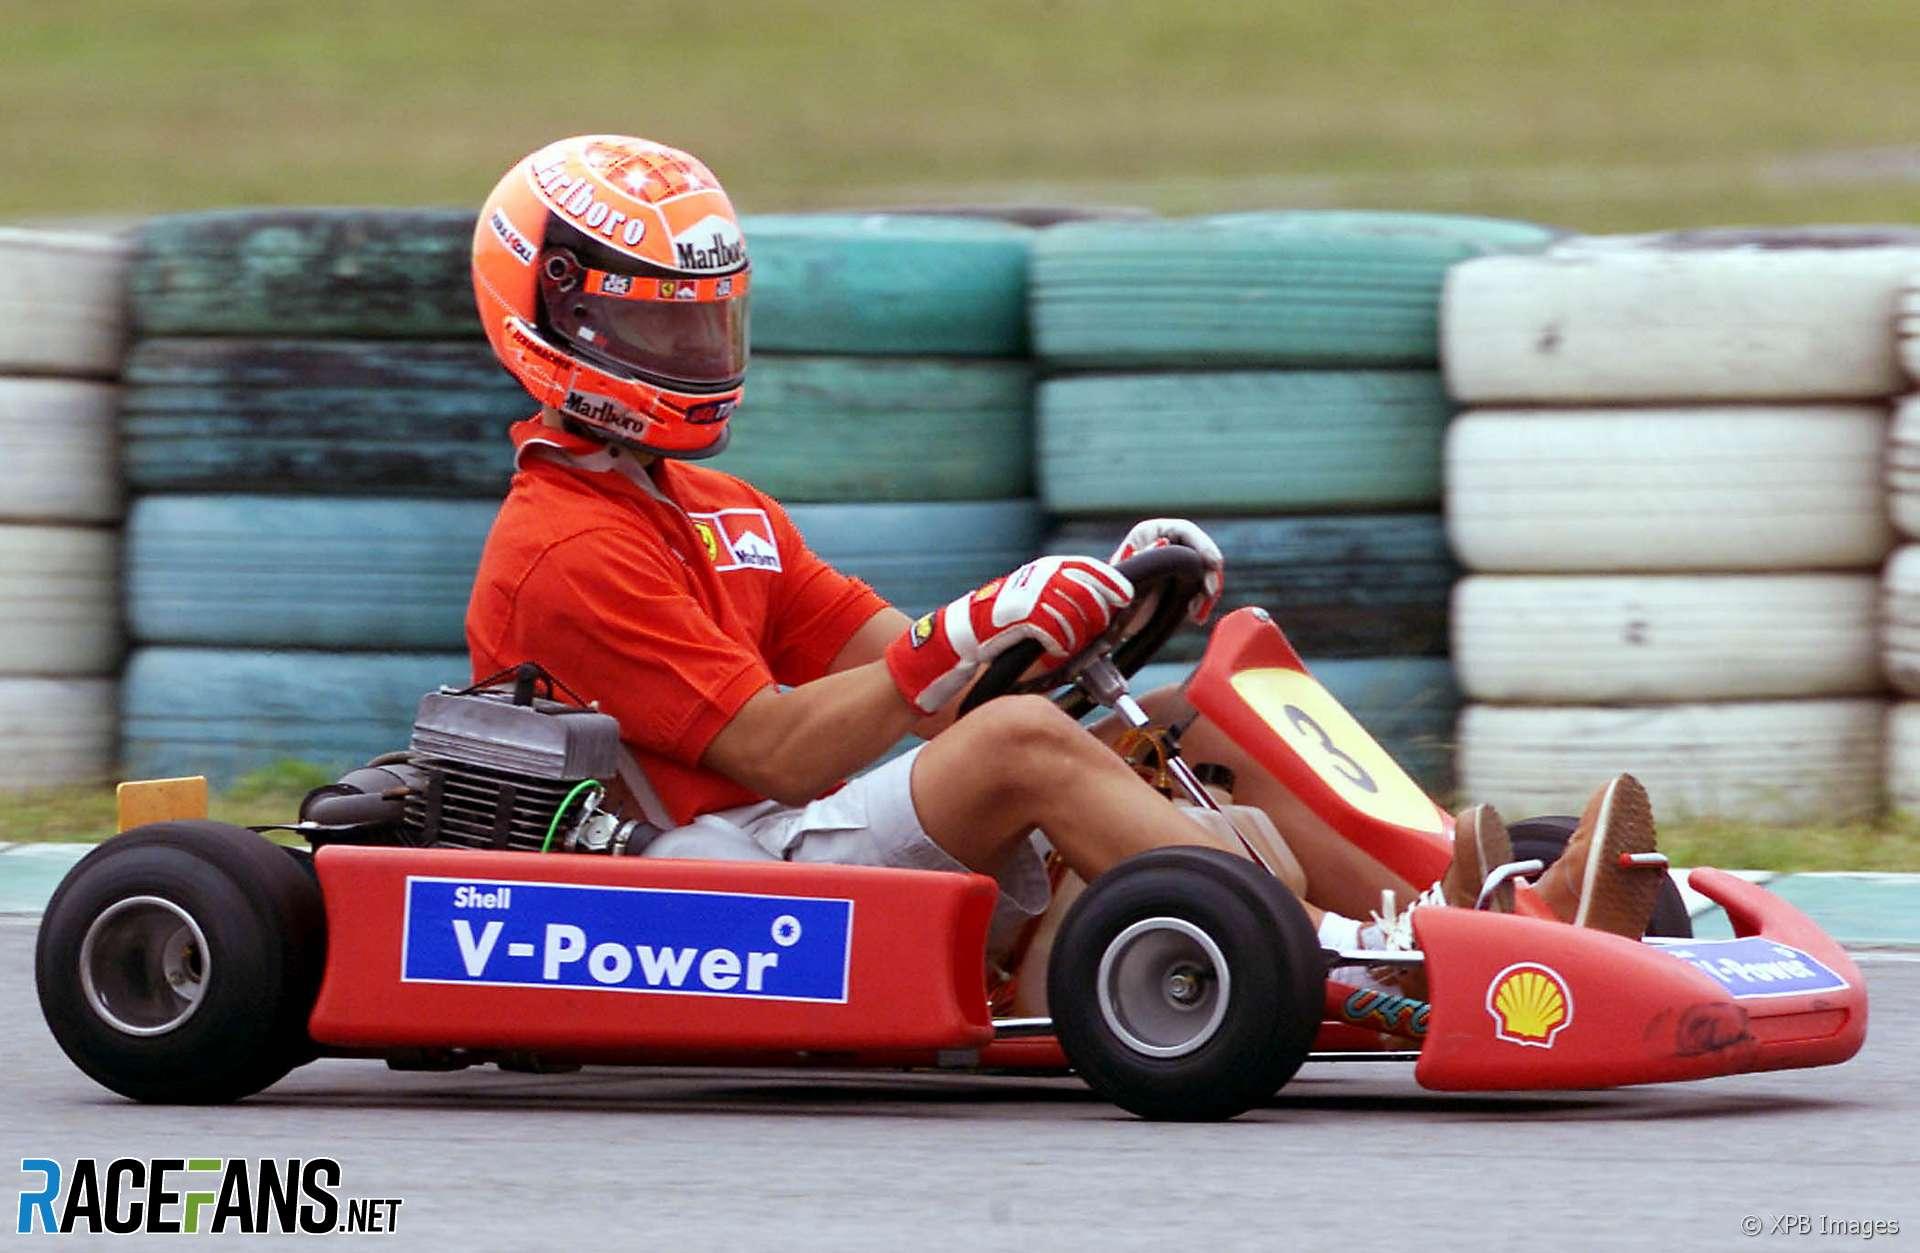 Gewinner Grand Prix 2021